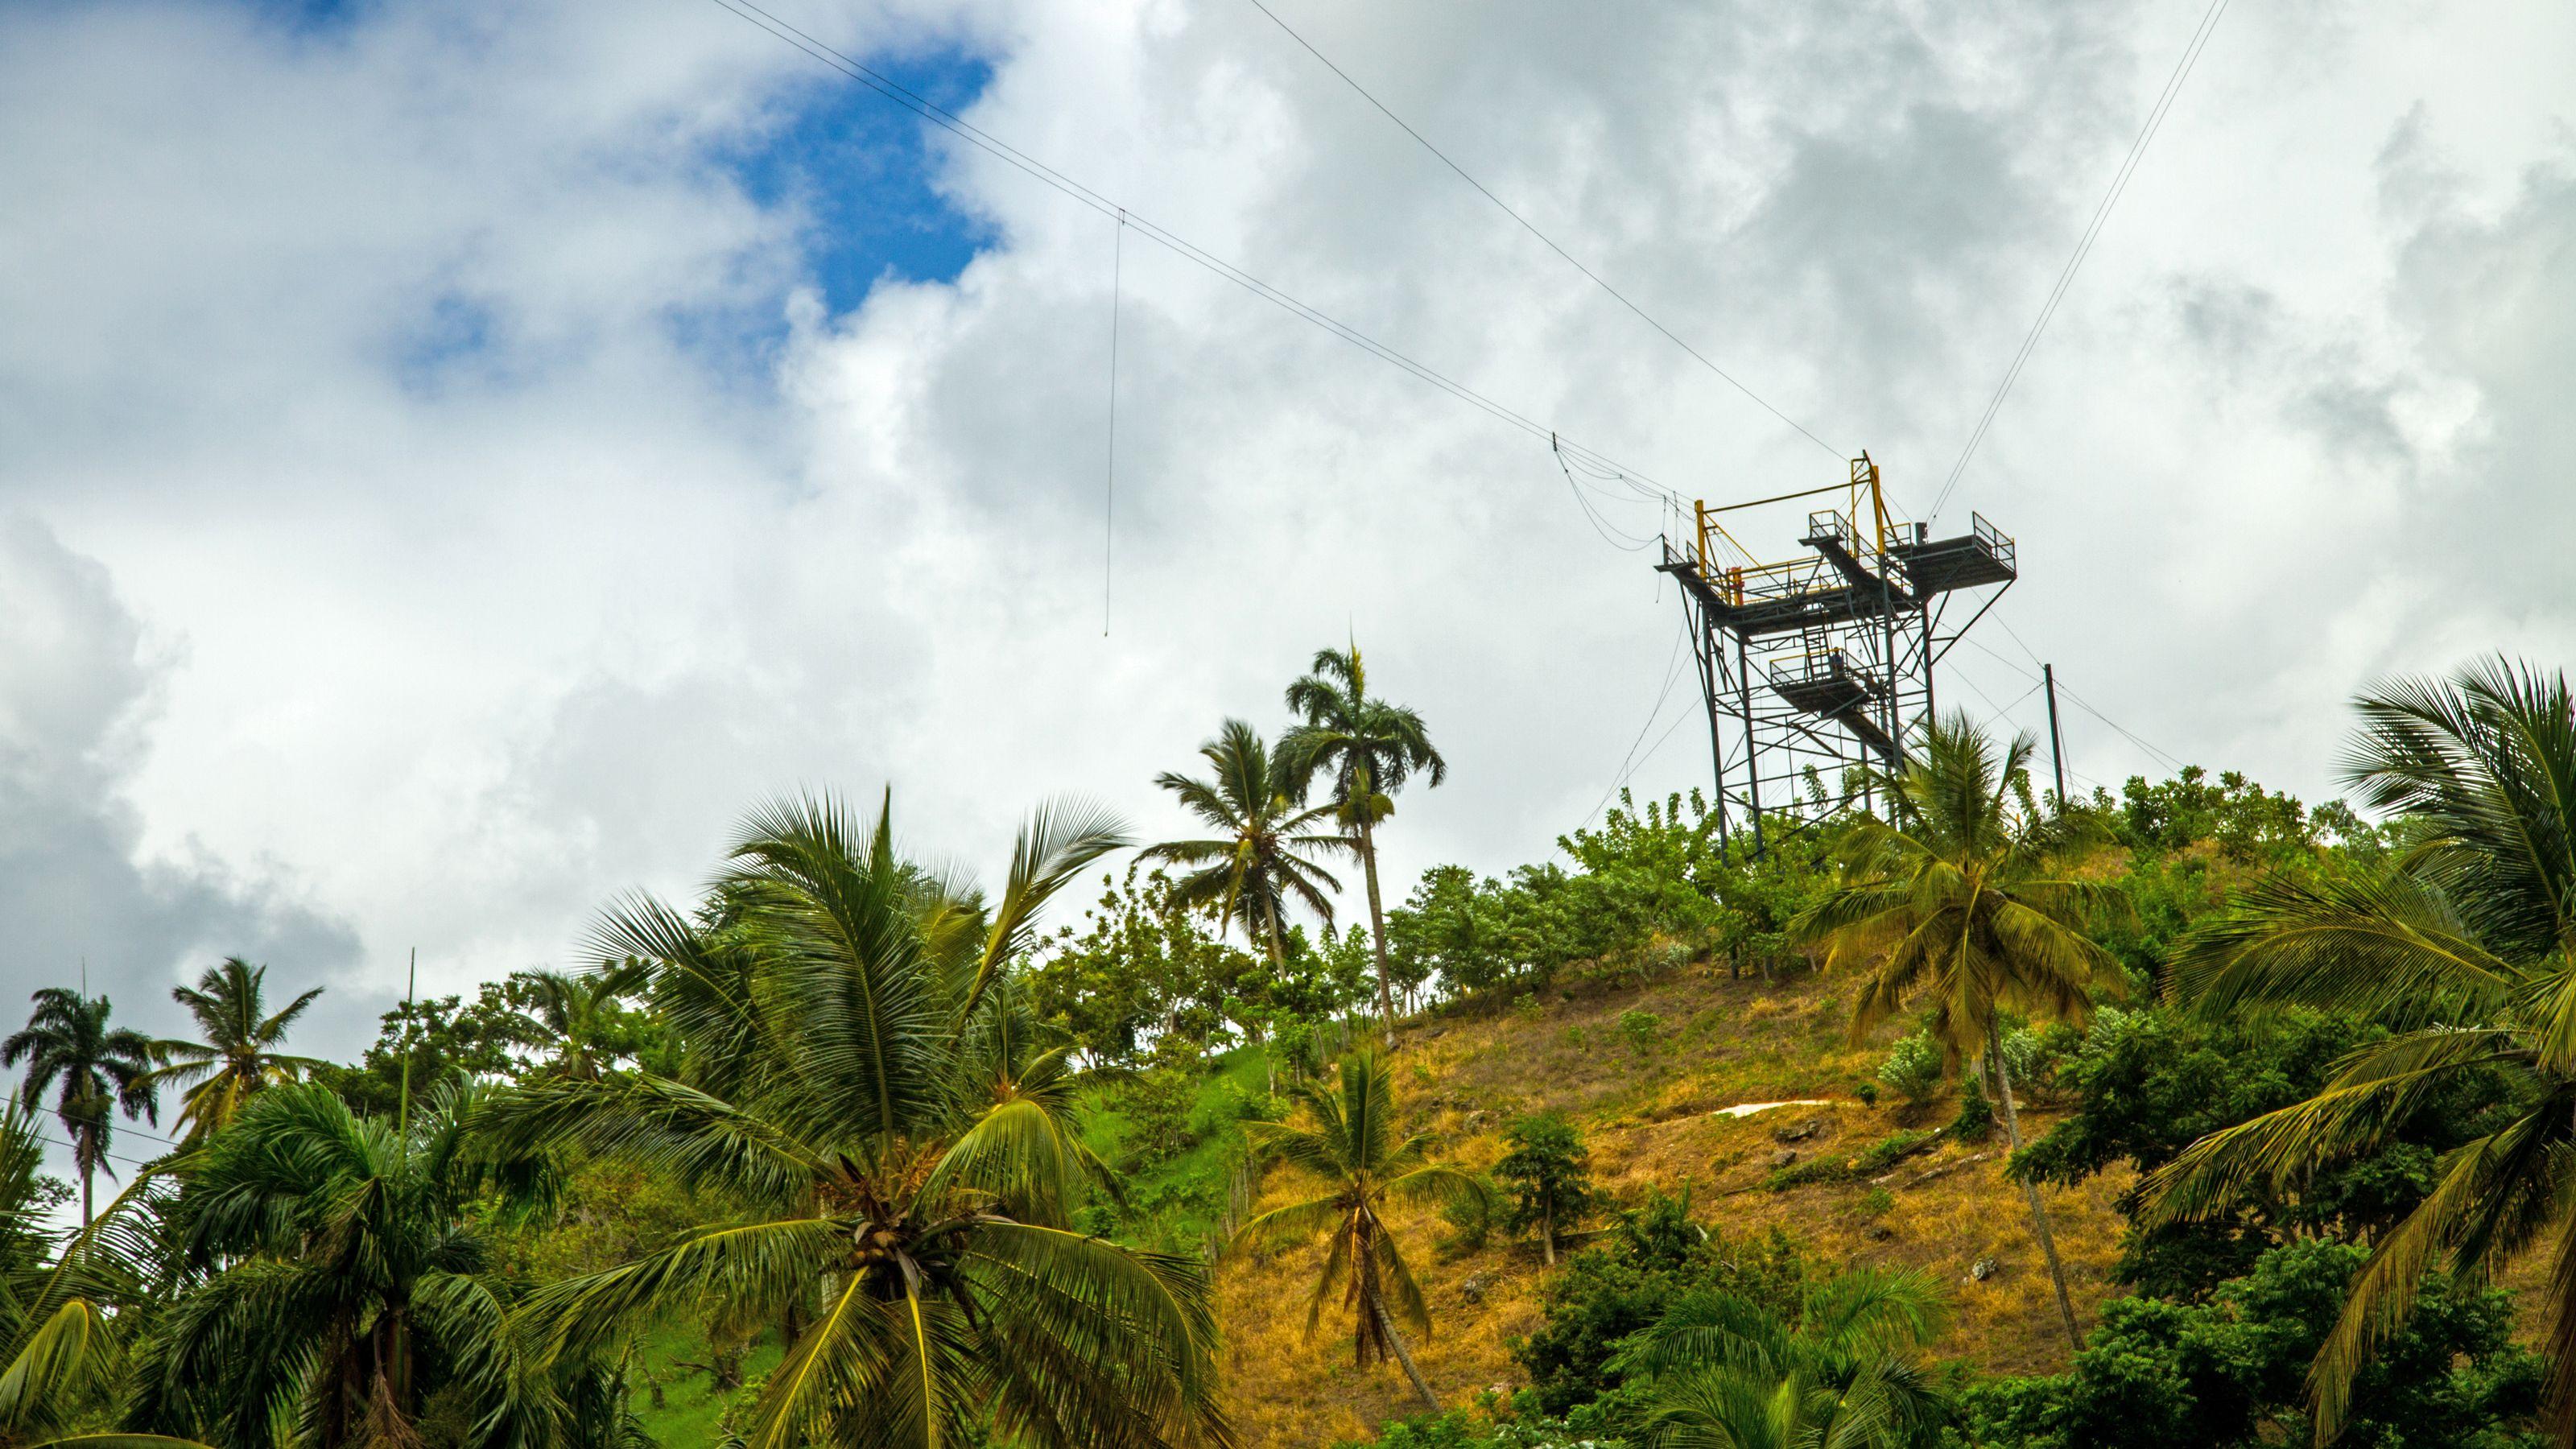 High platform in Punta Cana